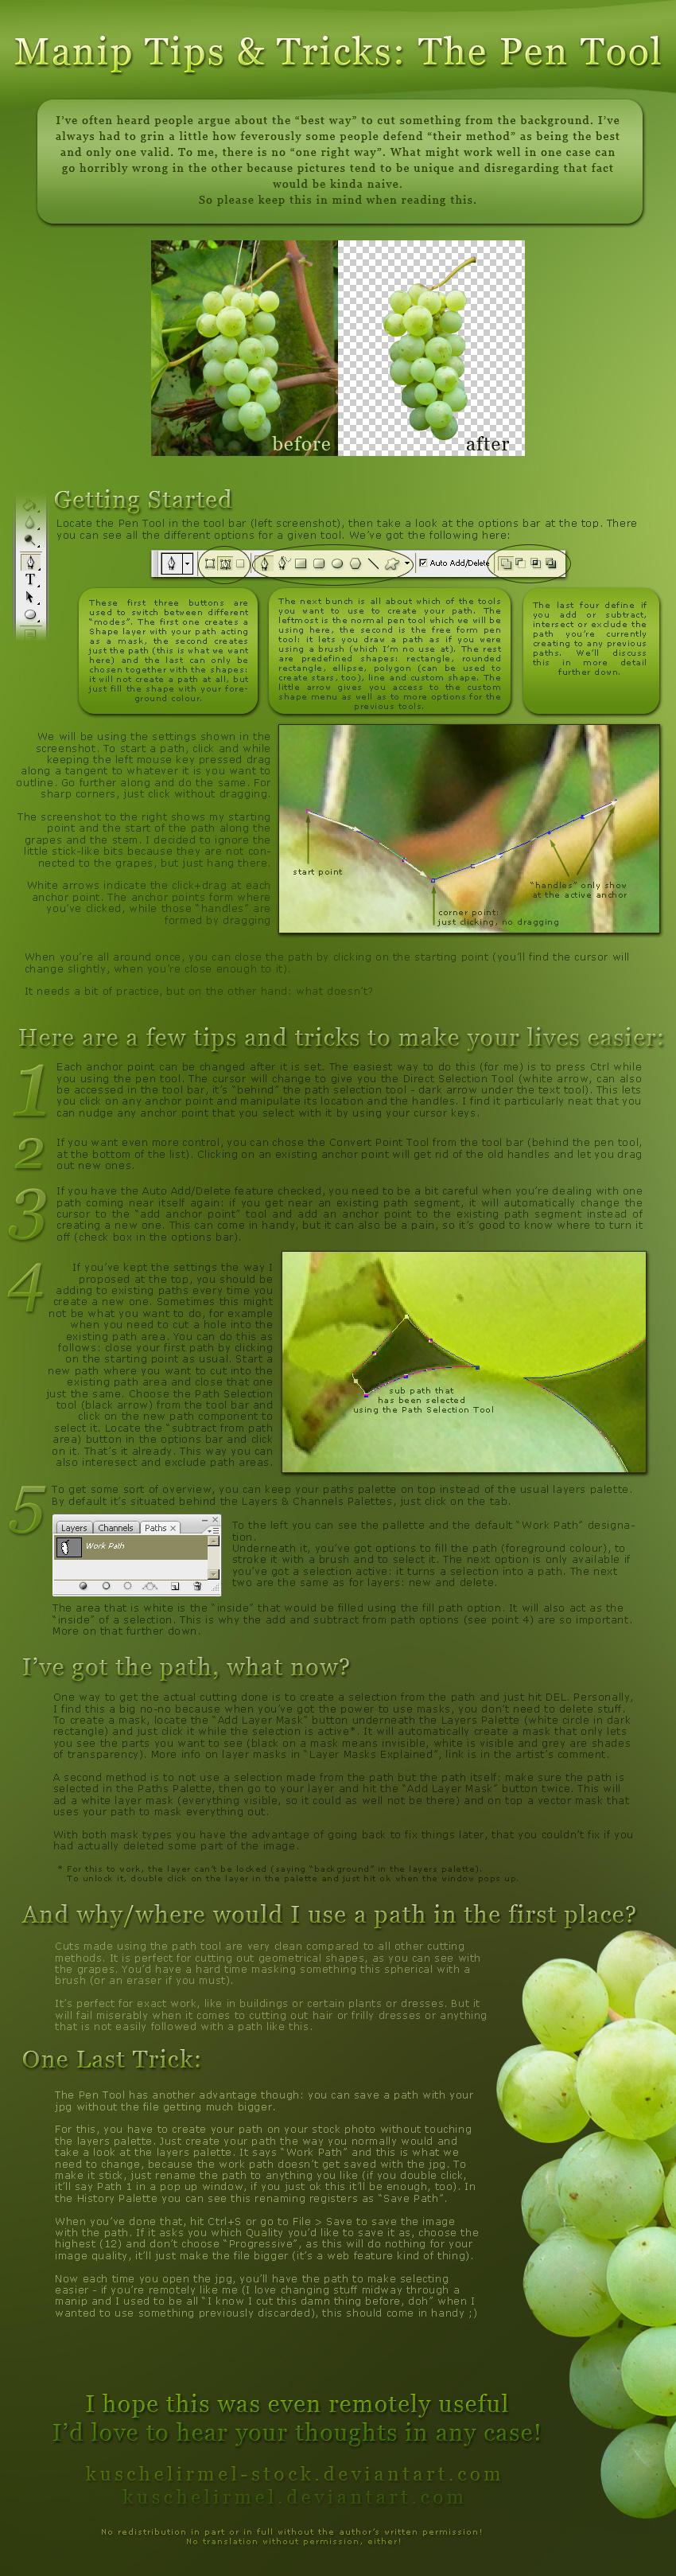 Manip Tips + Tricks: Pen Tool by kuschelirmel-stock